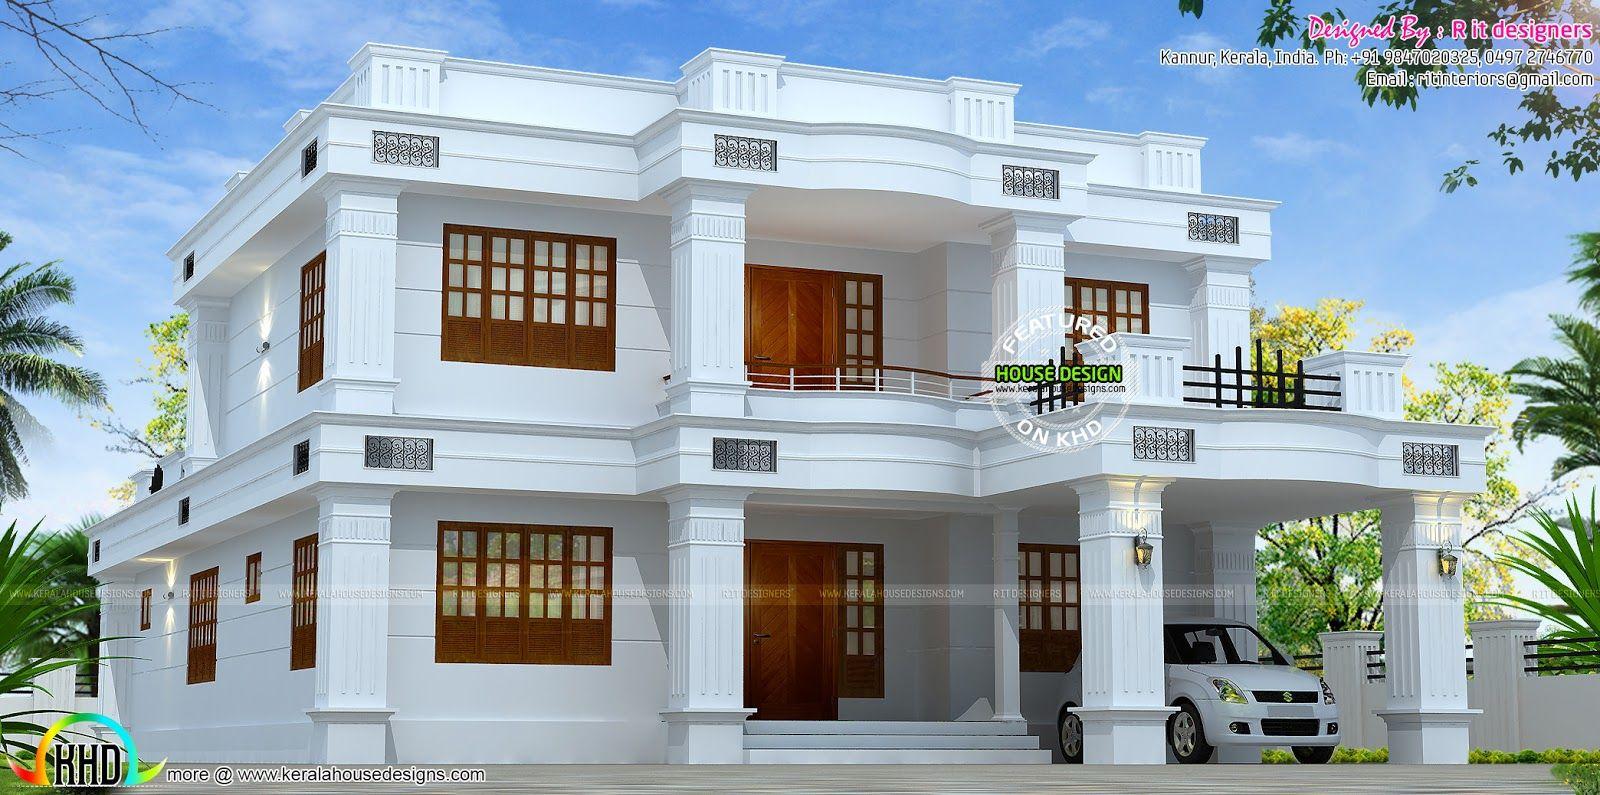 2785 sq-ft 5 bedroom Kerala home design | Decor in 2019